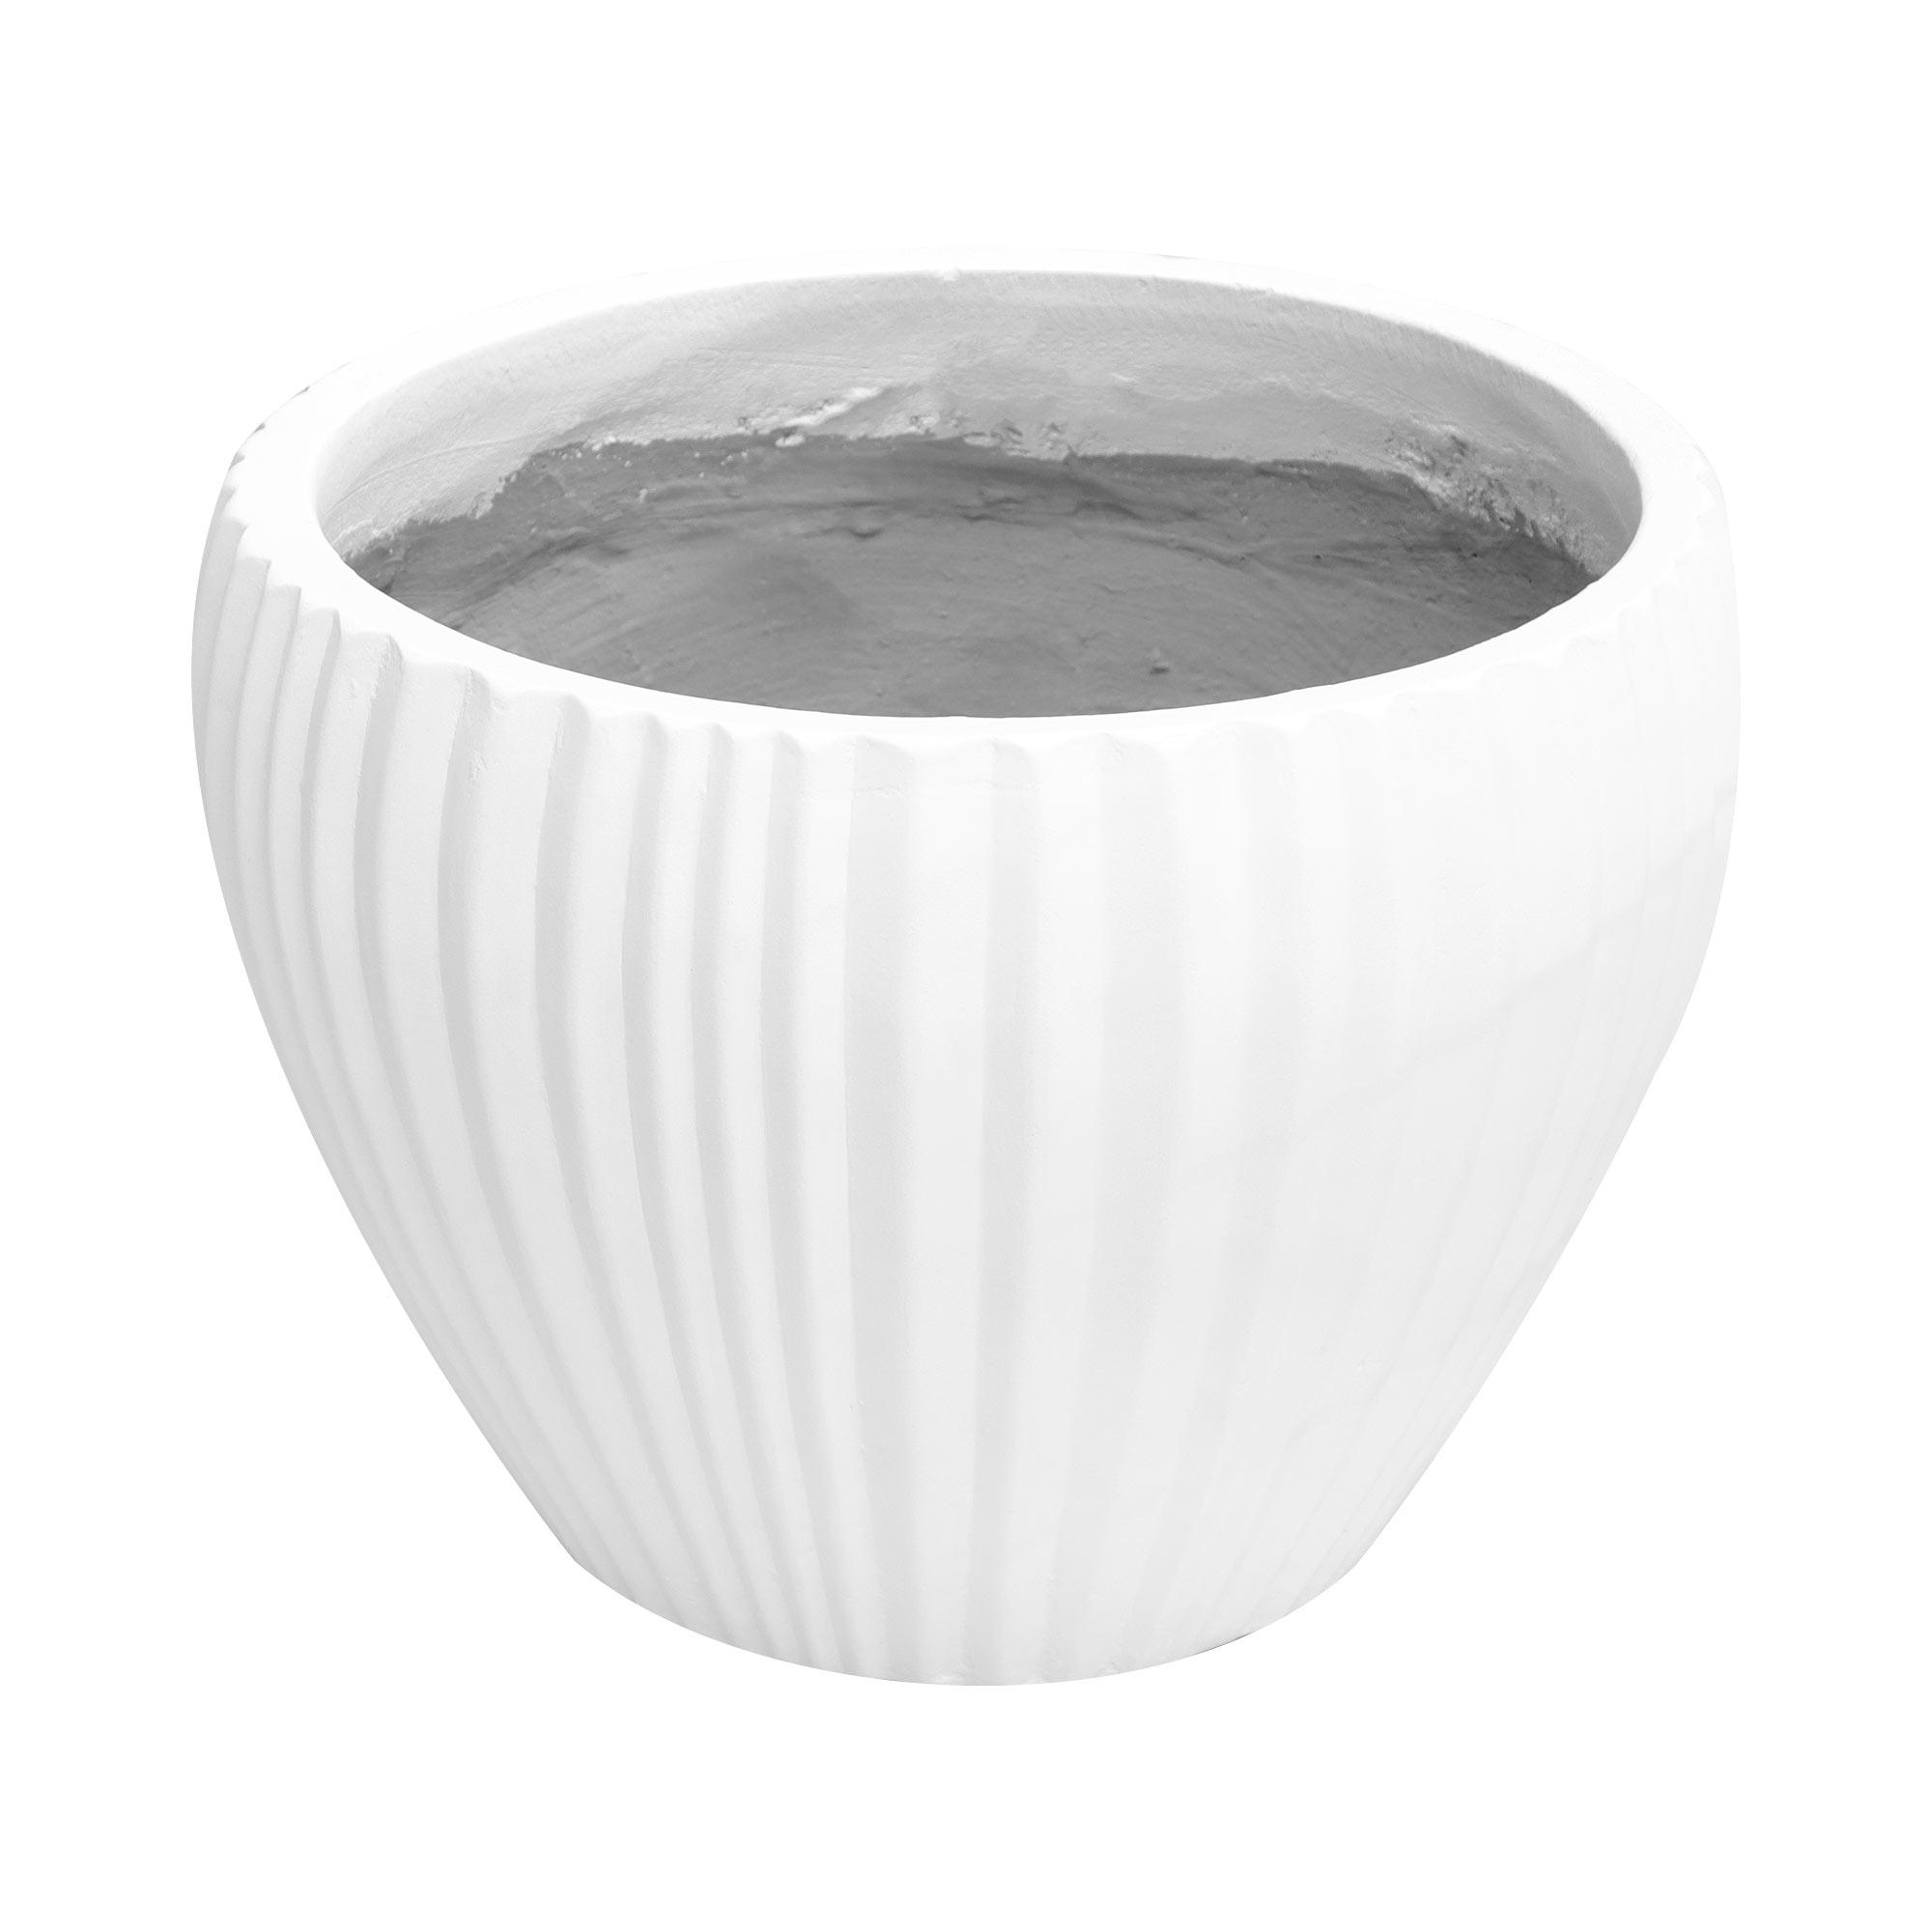 КашпоHoang pottery глазурь 42x30 см белое